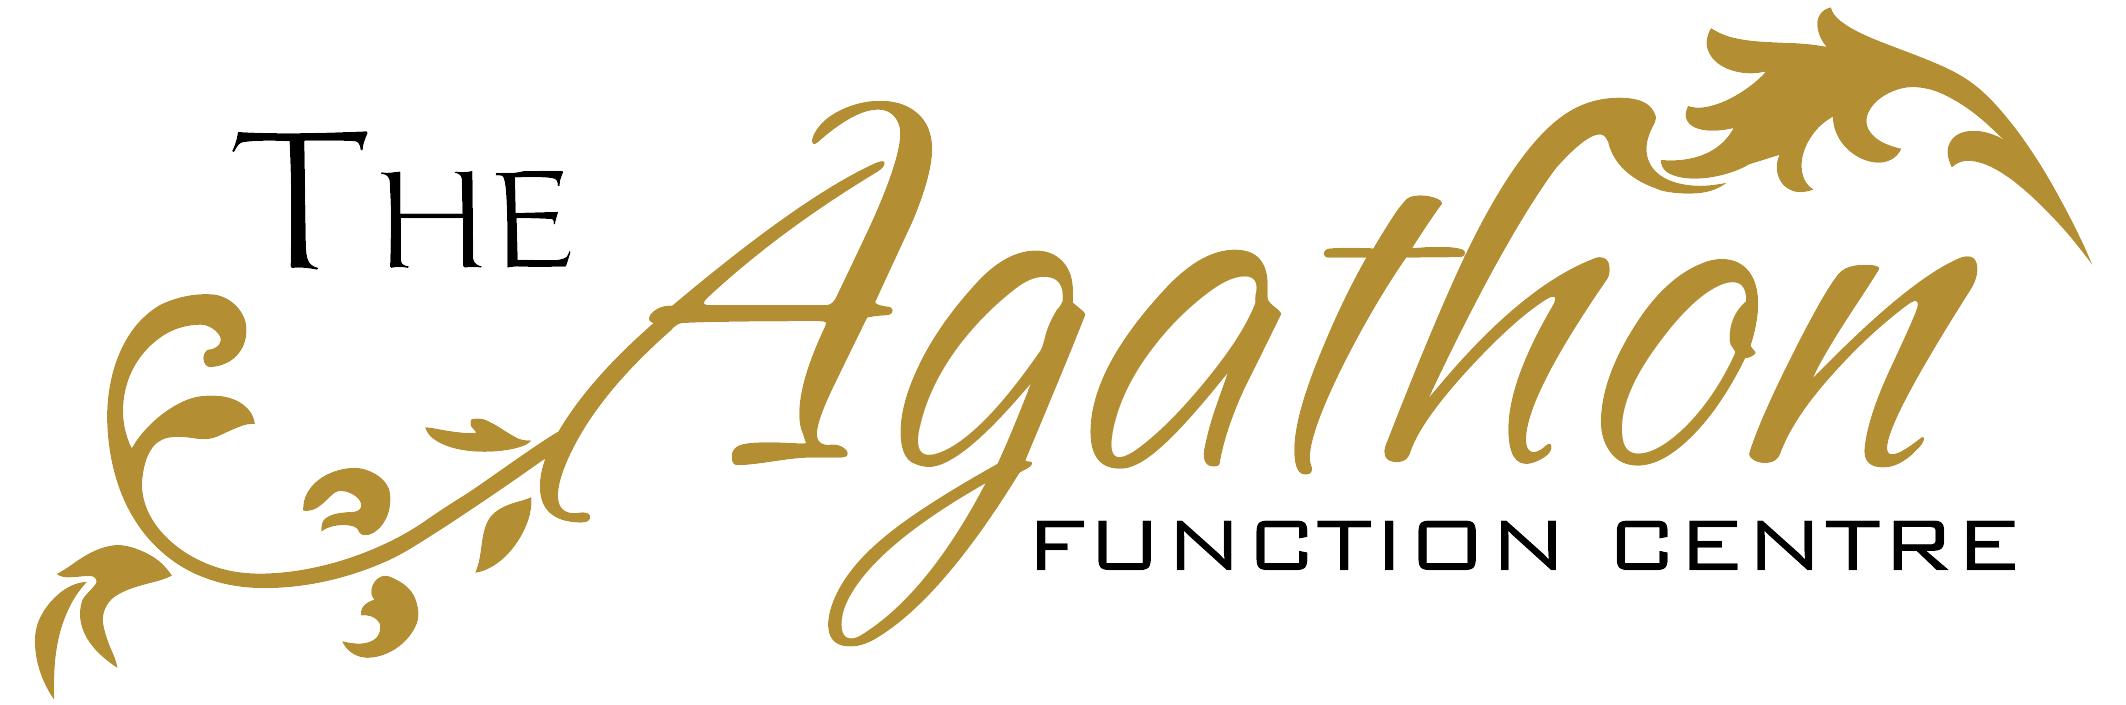 cropped-logo-agathon-function.png